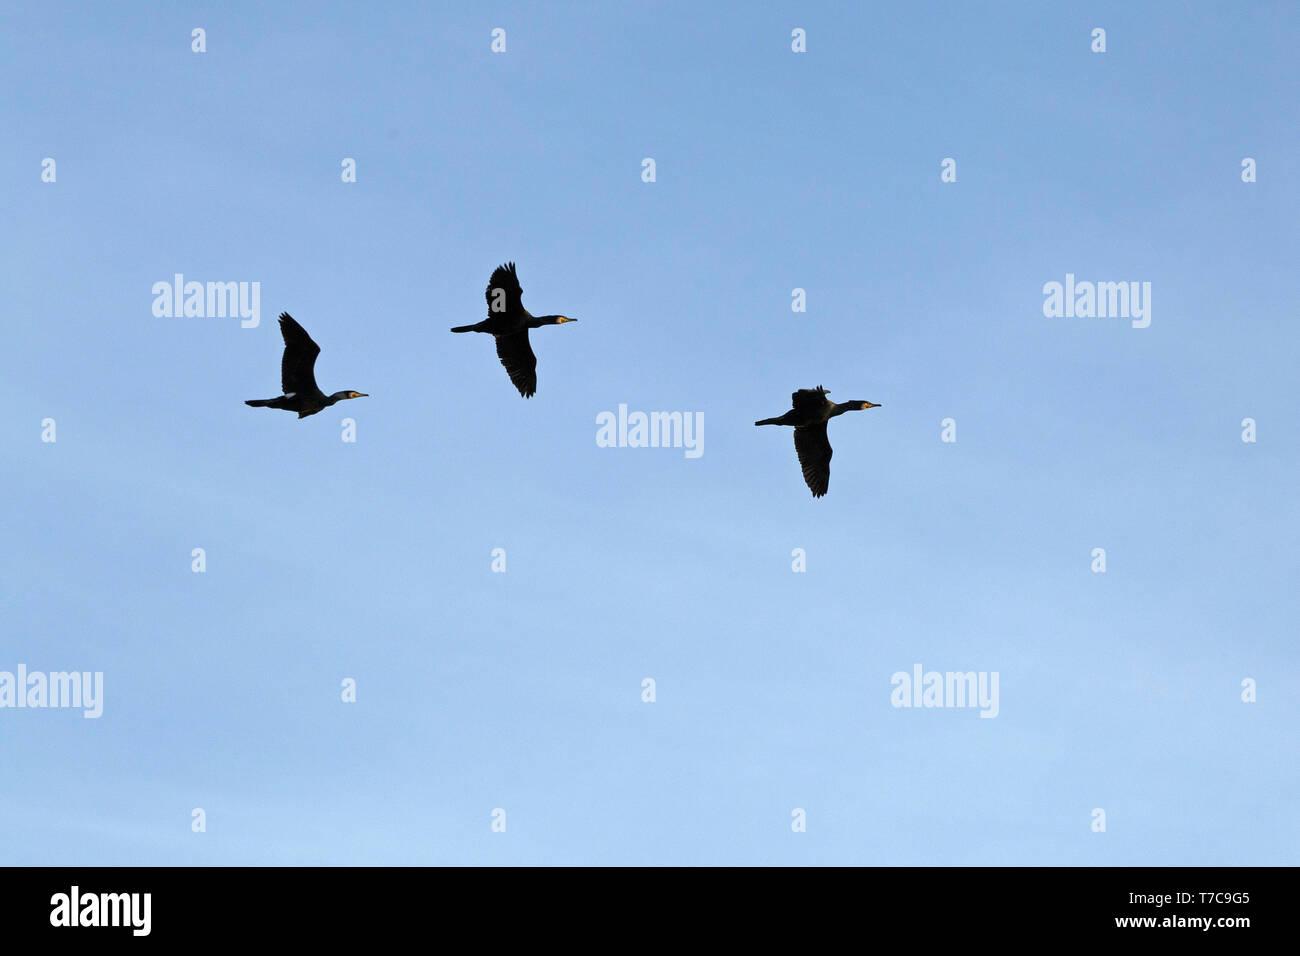 cormorants in flight, (Phalacrocorax carbo), harbour, Hamburg, Germany - Stock Image